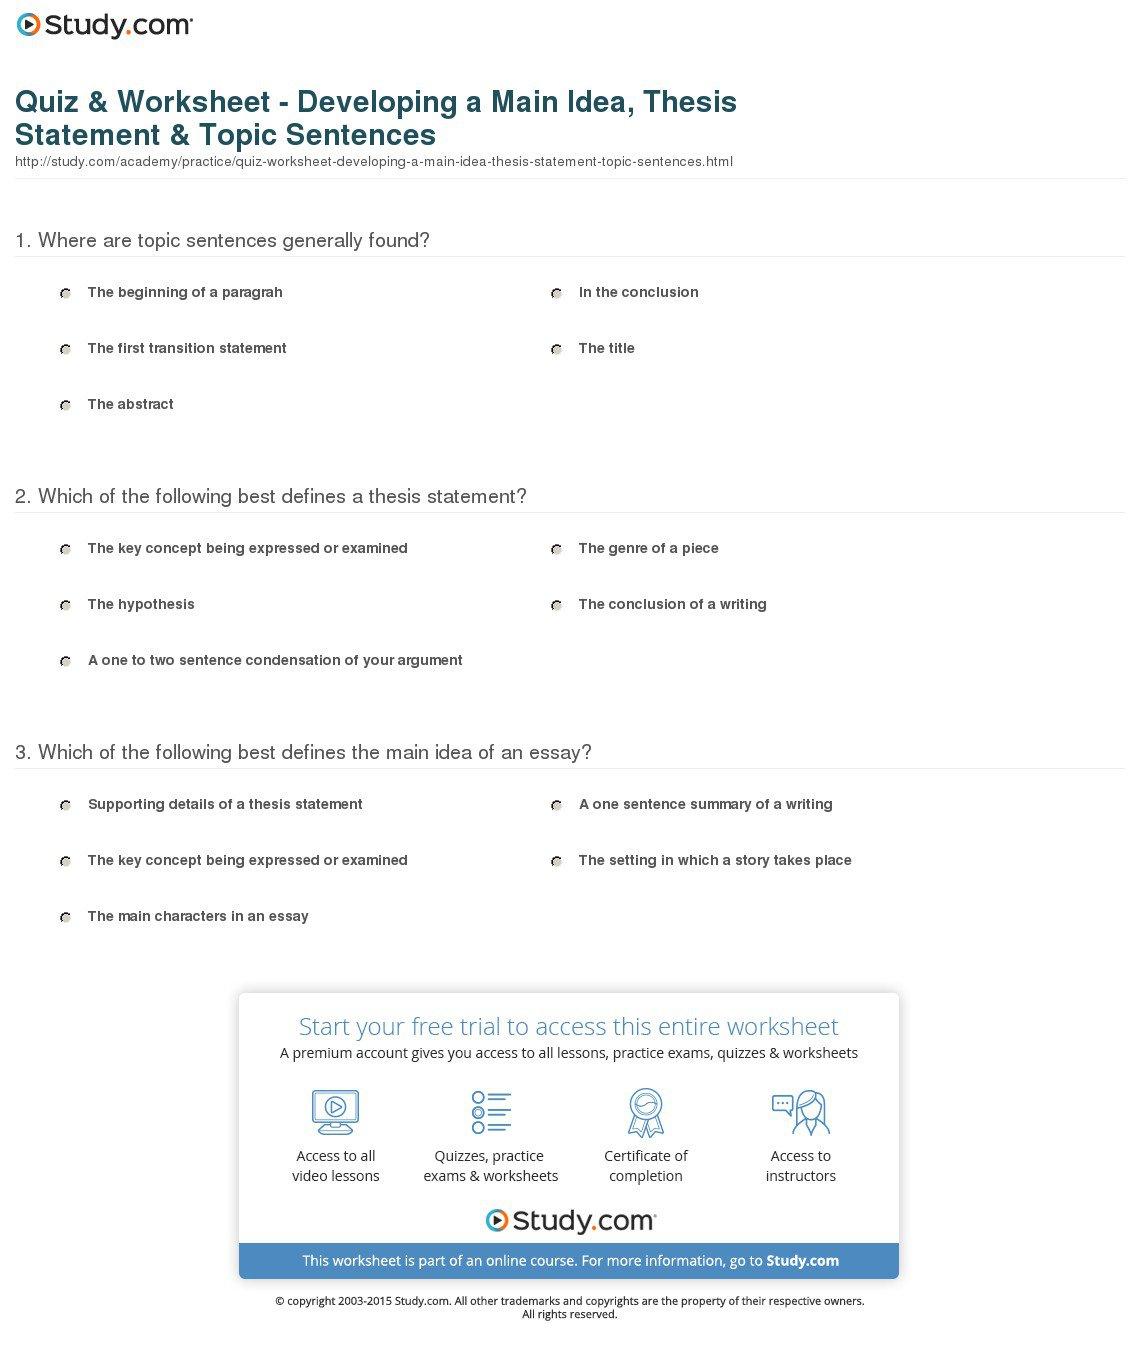 Thesis Best Statement Quiz Worksheet Developing Main Idea Topic